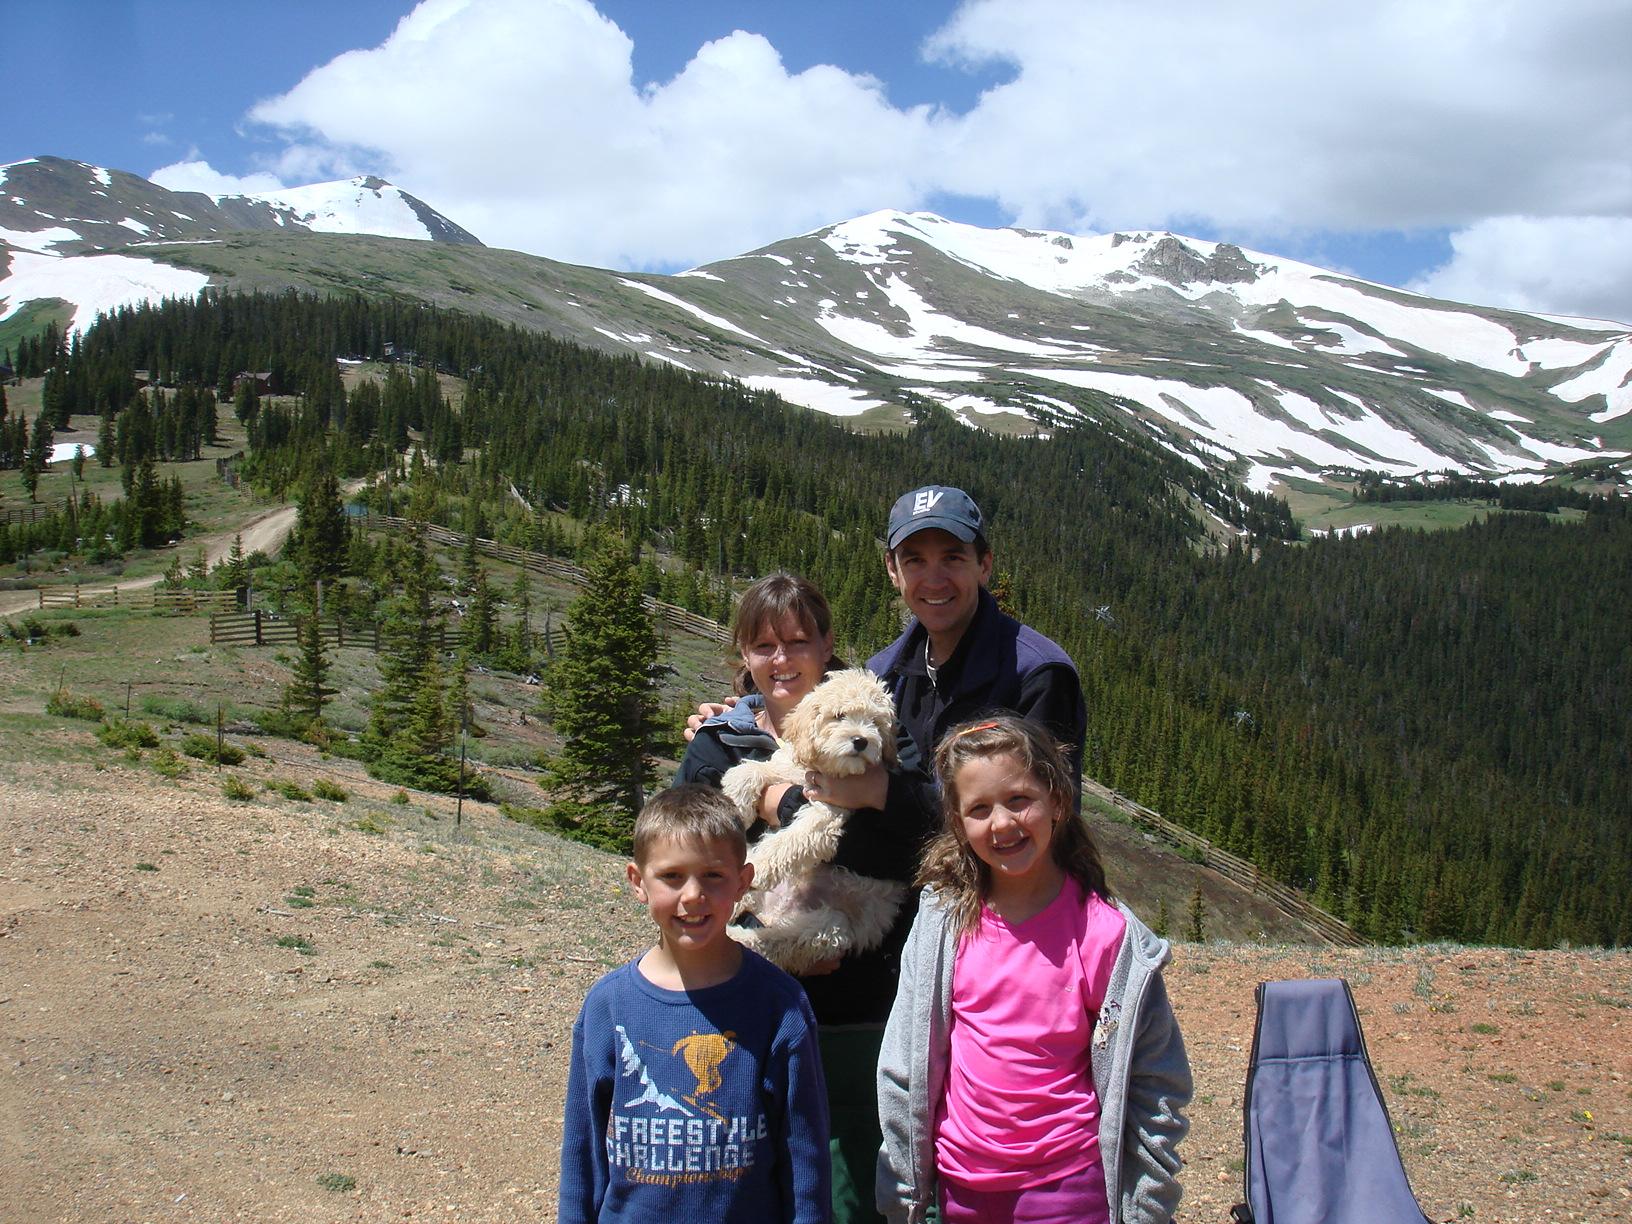 Dean and family on Peak 9, Breckenridge